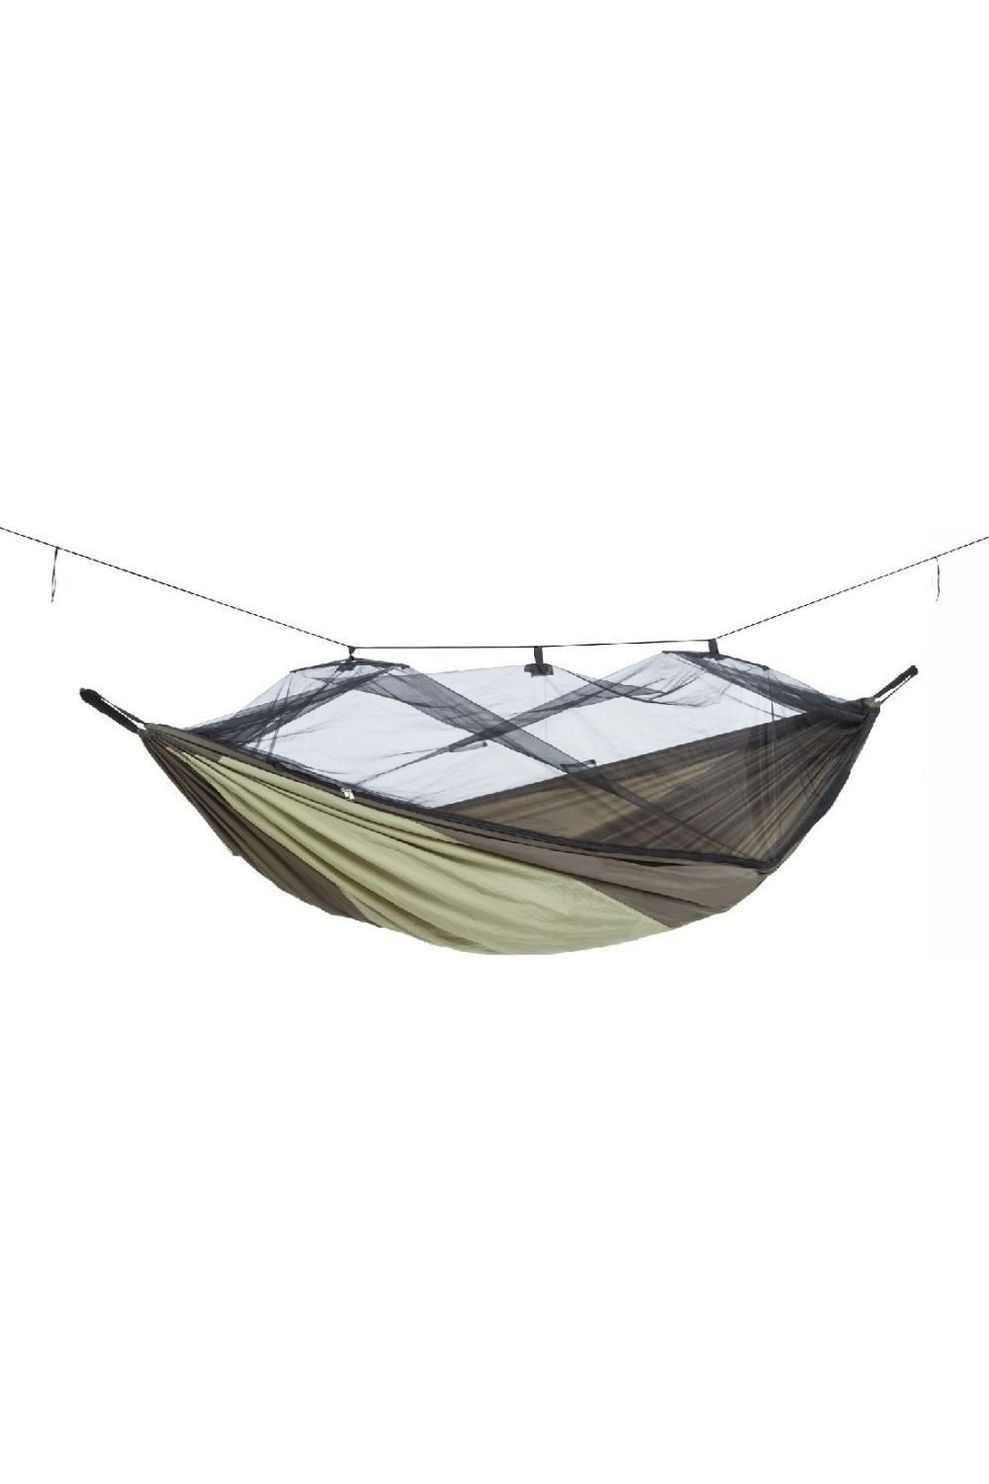 Amazonas Hangmat Moskito-Traveller Thermo Xxl - LichtGroen